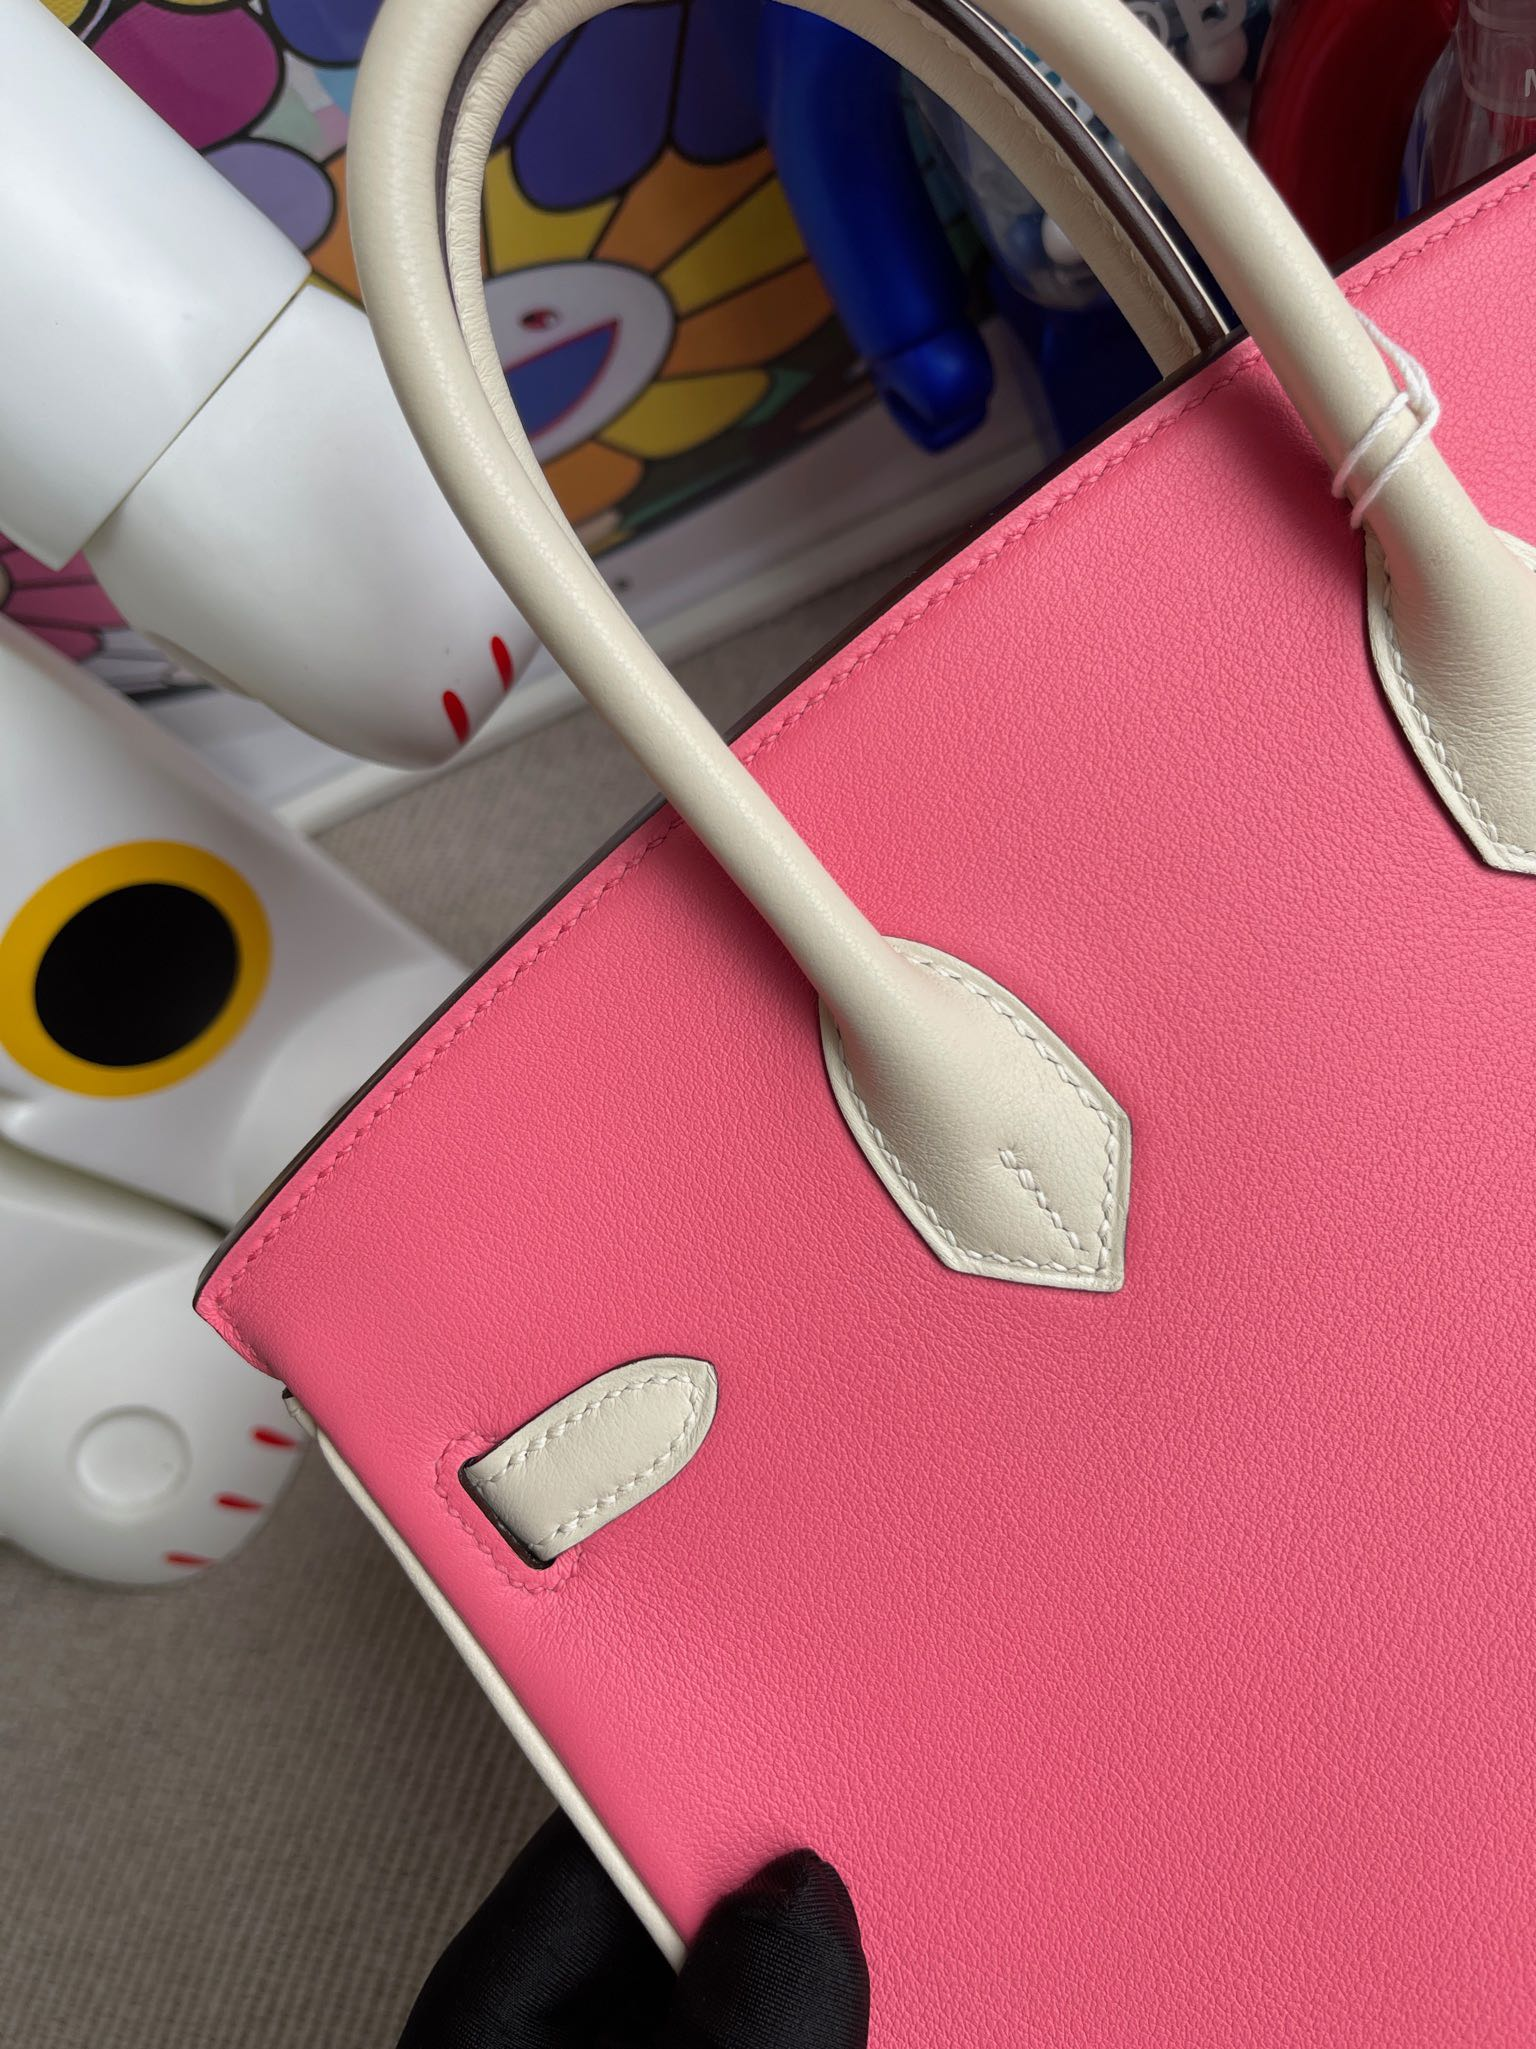 Hermès(爱马仕)Birkin 铂金包 Swift 唇膏粉 拼 奶白 金扣 马蹄印 25cm 顶级手缝